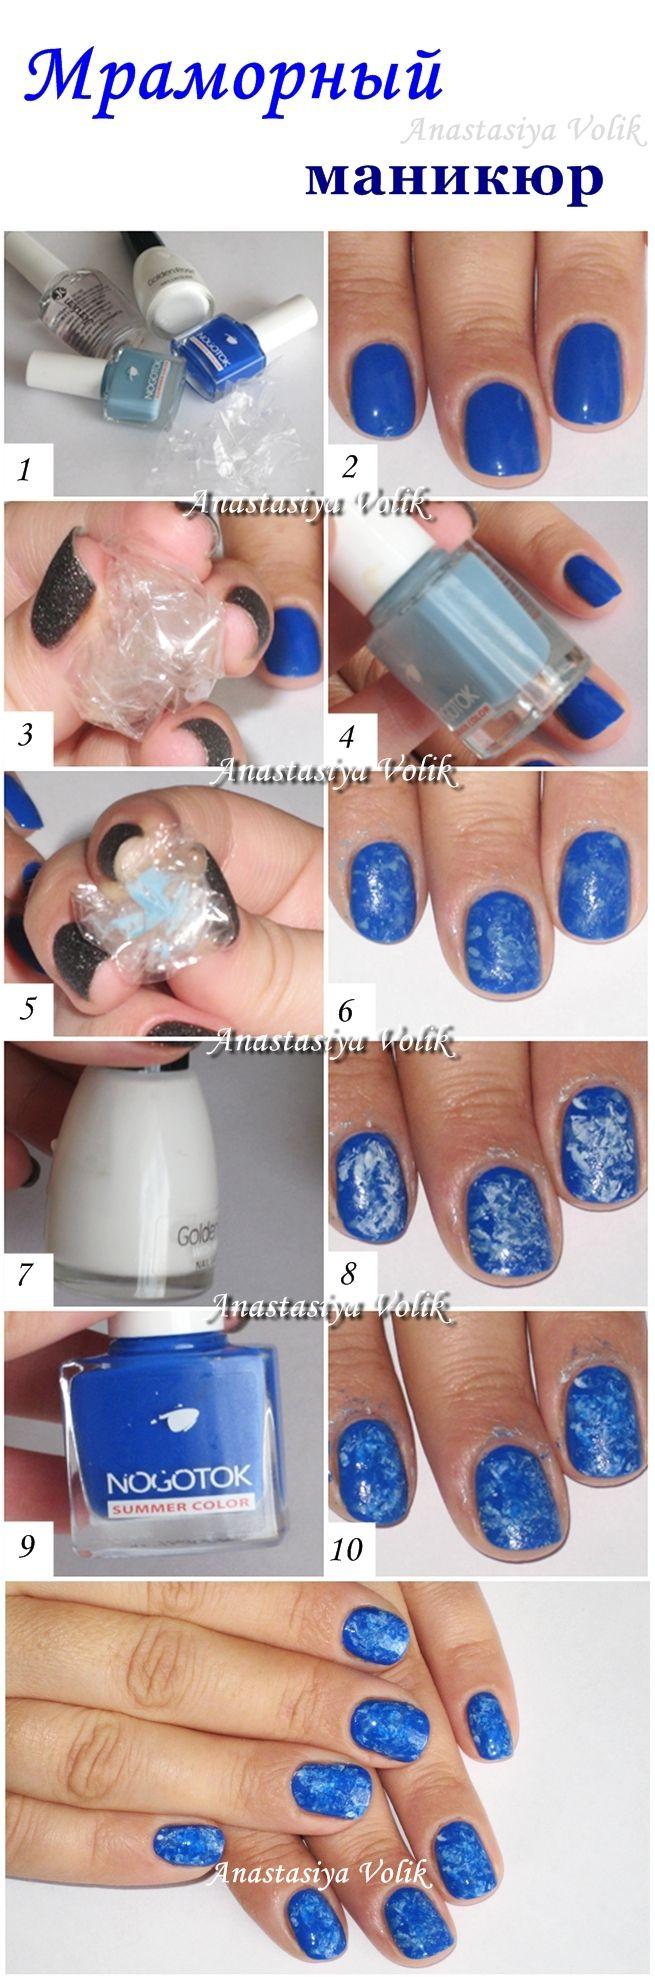 #Nail #Nails #Nail-art #design #Ногти #Маникюр #Идея_для_маникюра #мрамор #мраморный_маникюр #мраморныйманикюр #фотоурокмраморногоманикюра